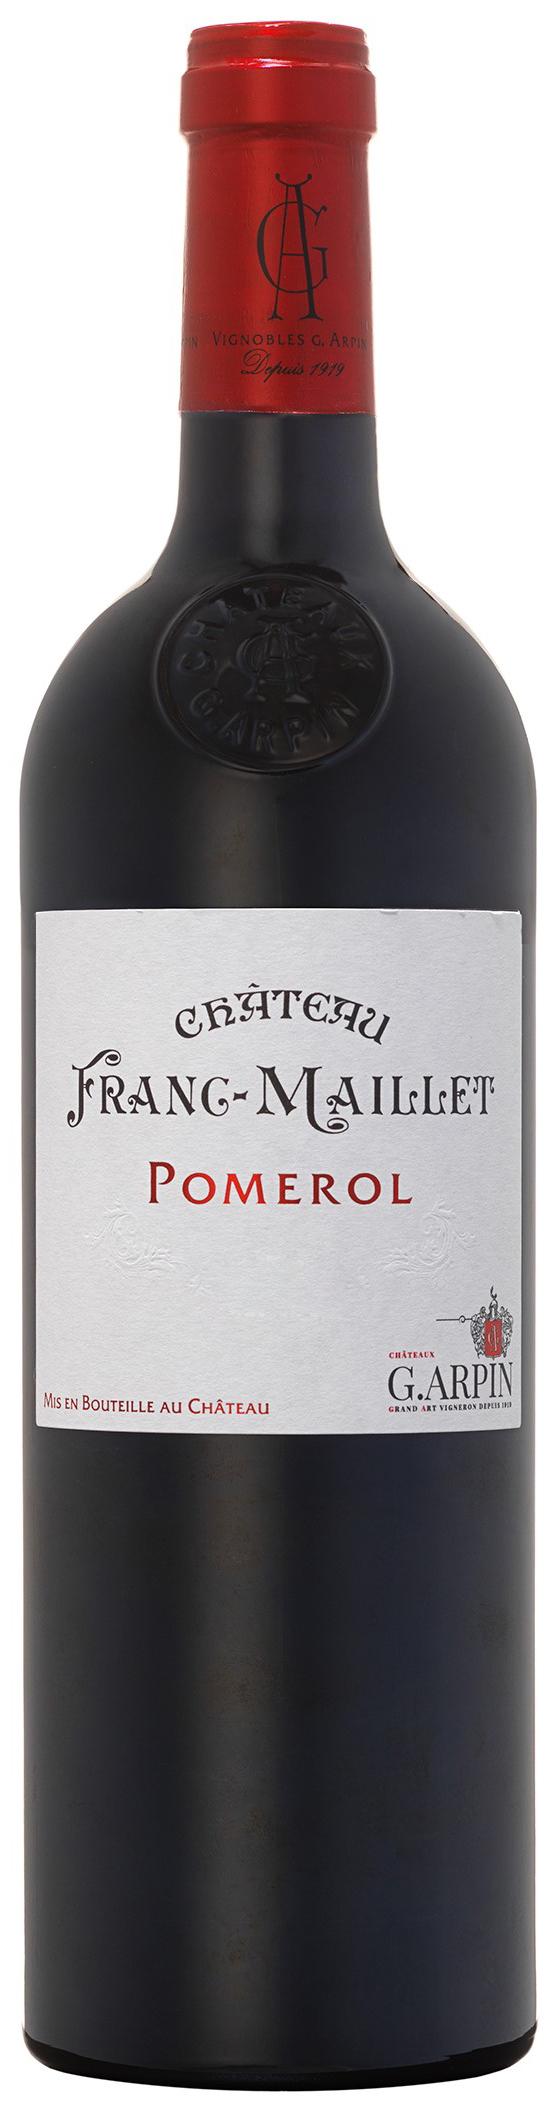 image of Château Franc-Maillet Pomerol 2016